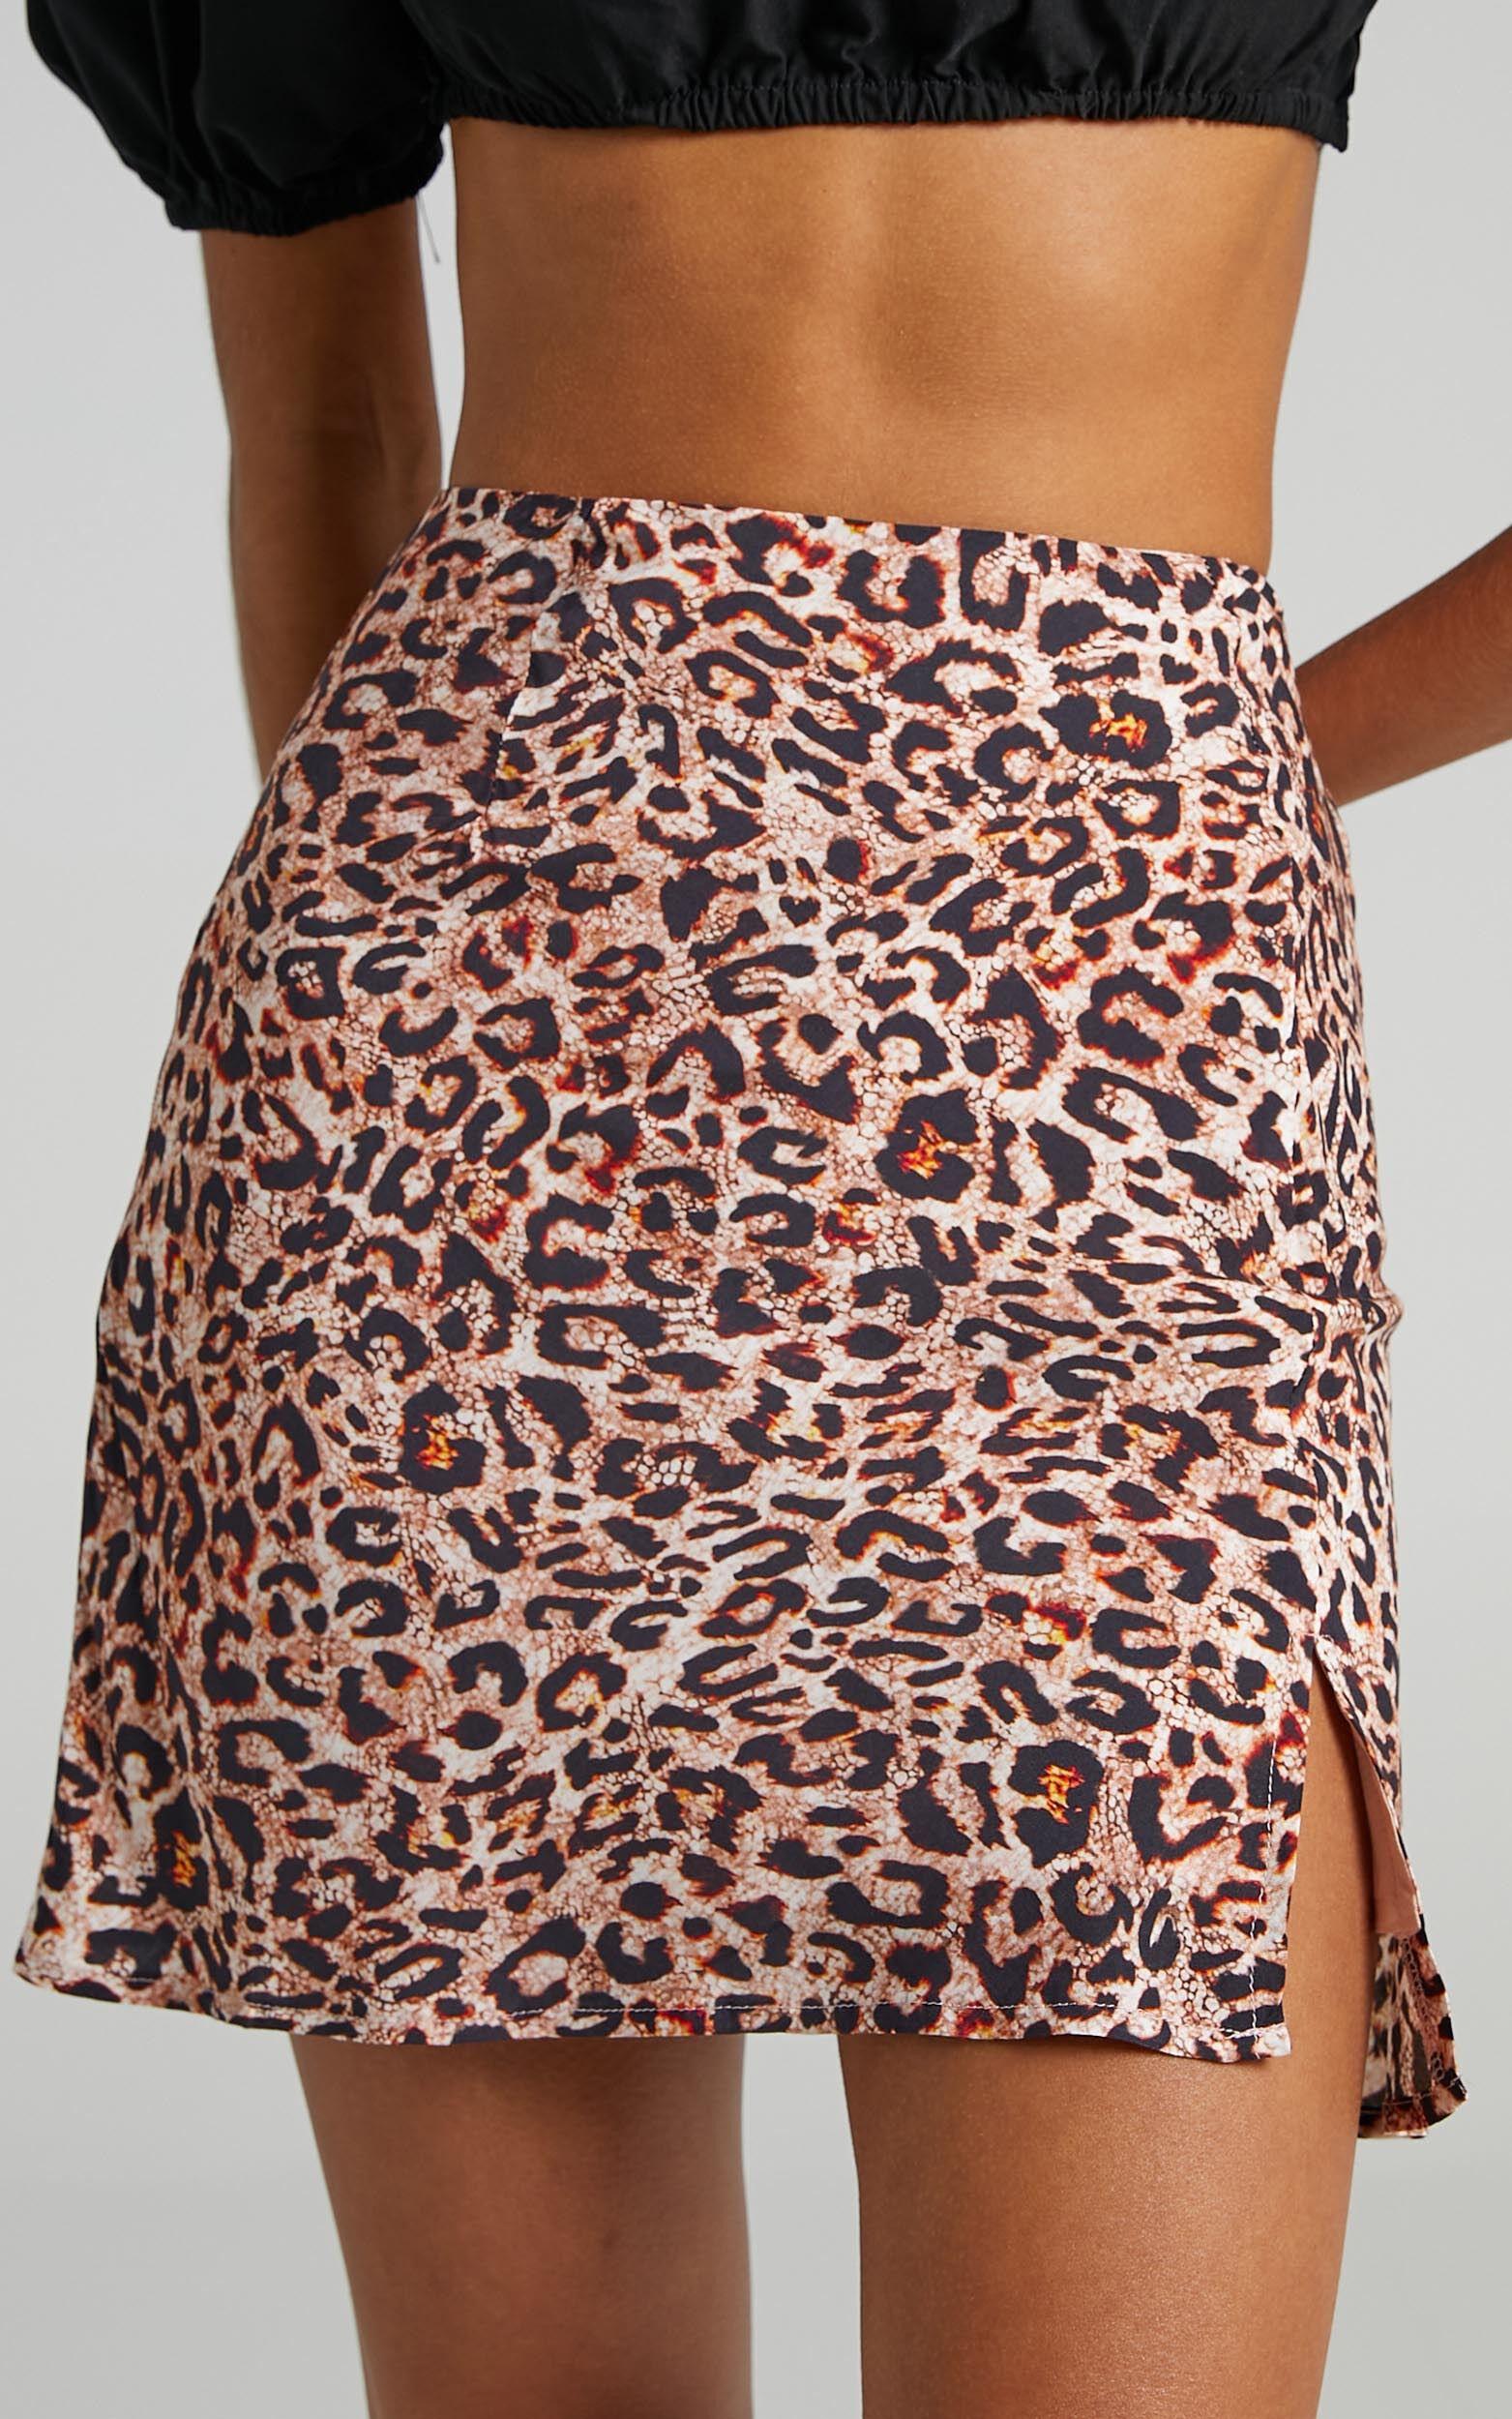 Stand In Line Skirt in Leopard - 06, BRN1, super-hi-res image number null